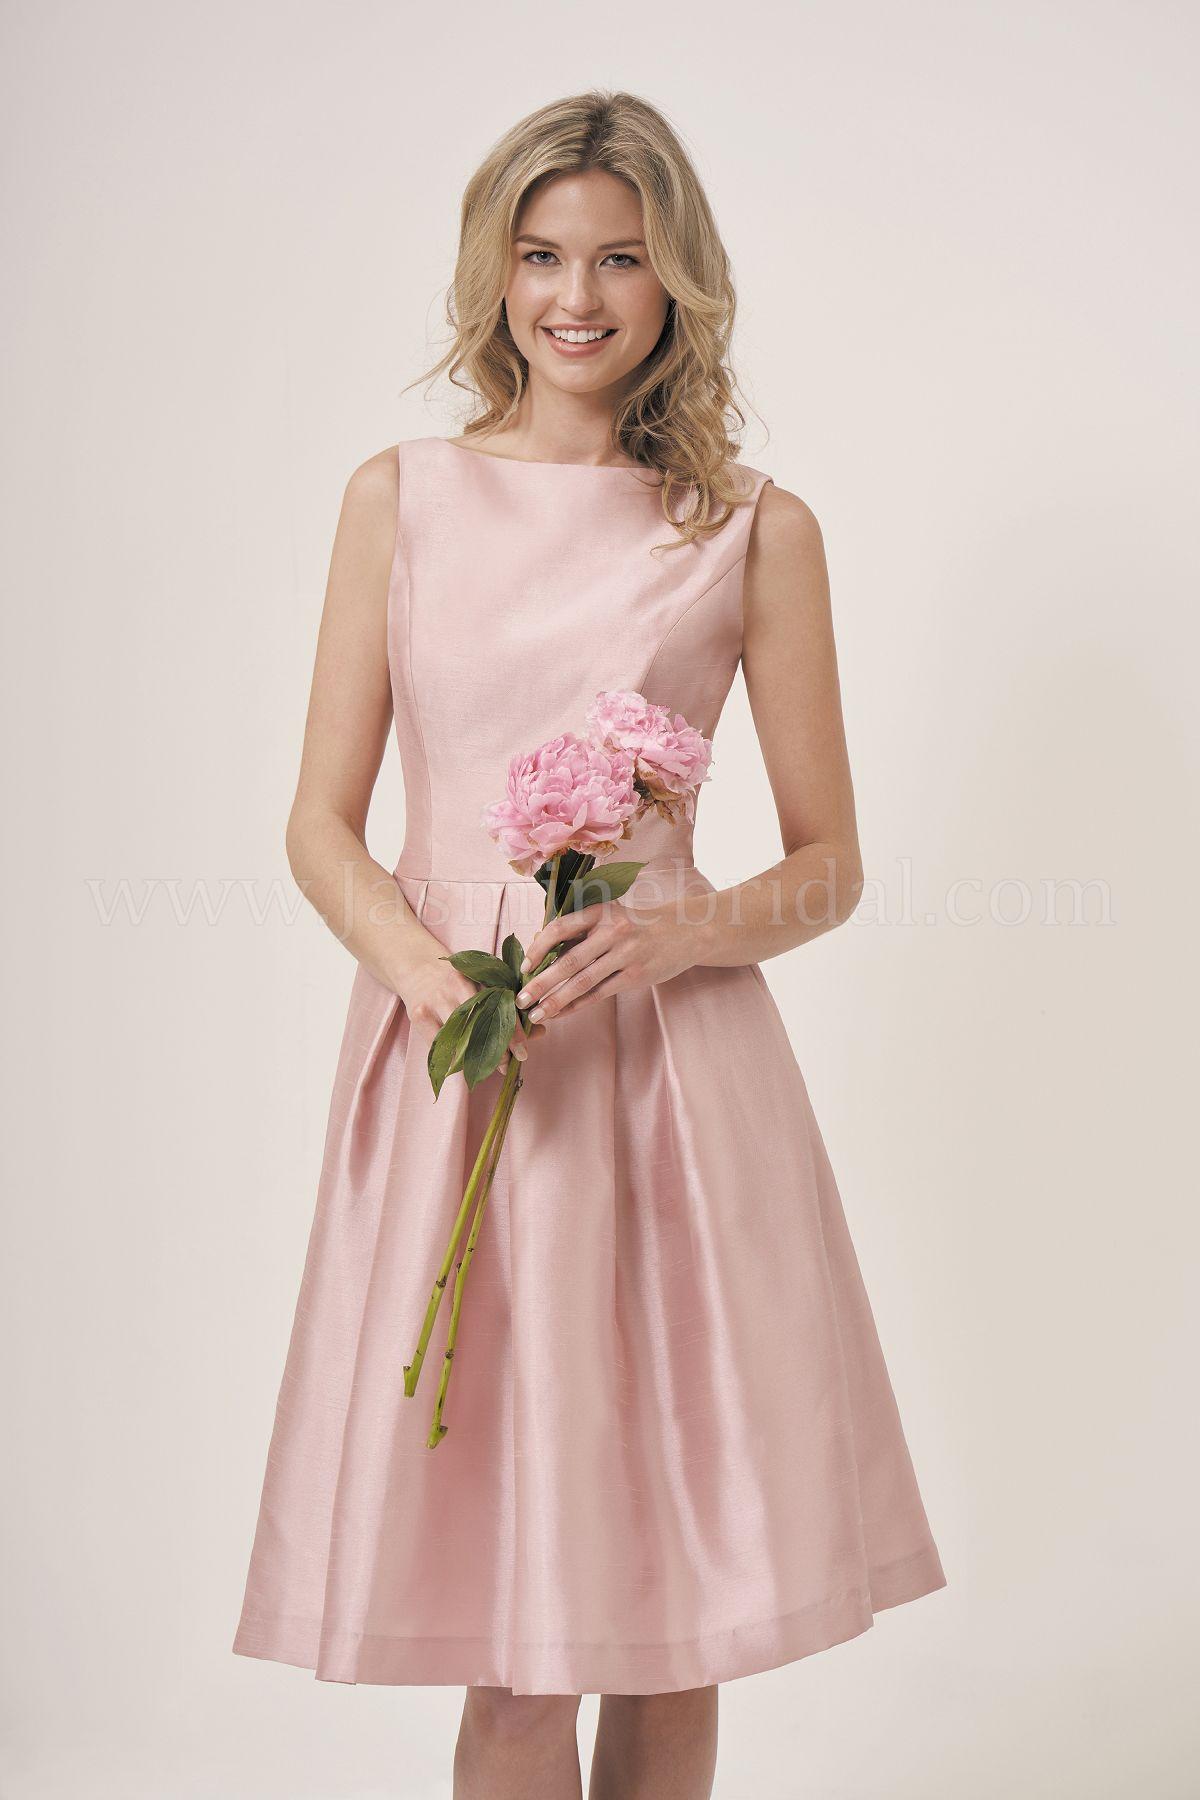 bridesmaid-dresses-P196062K-F